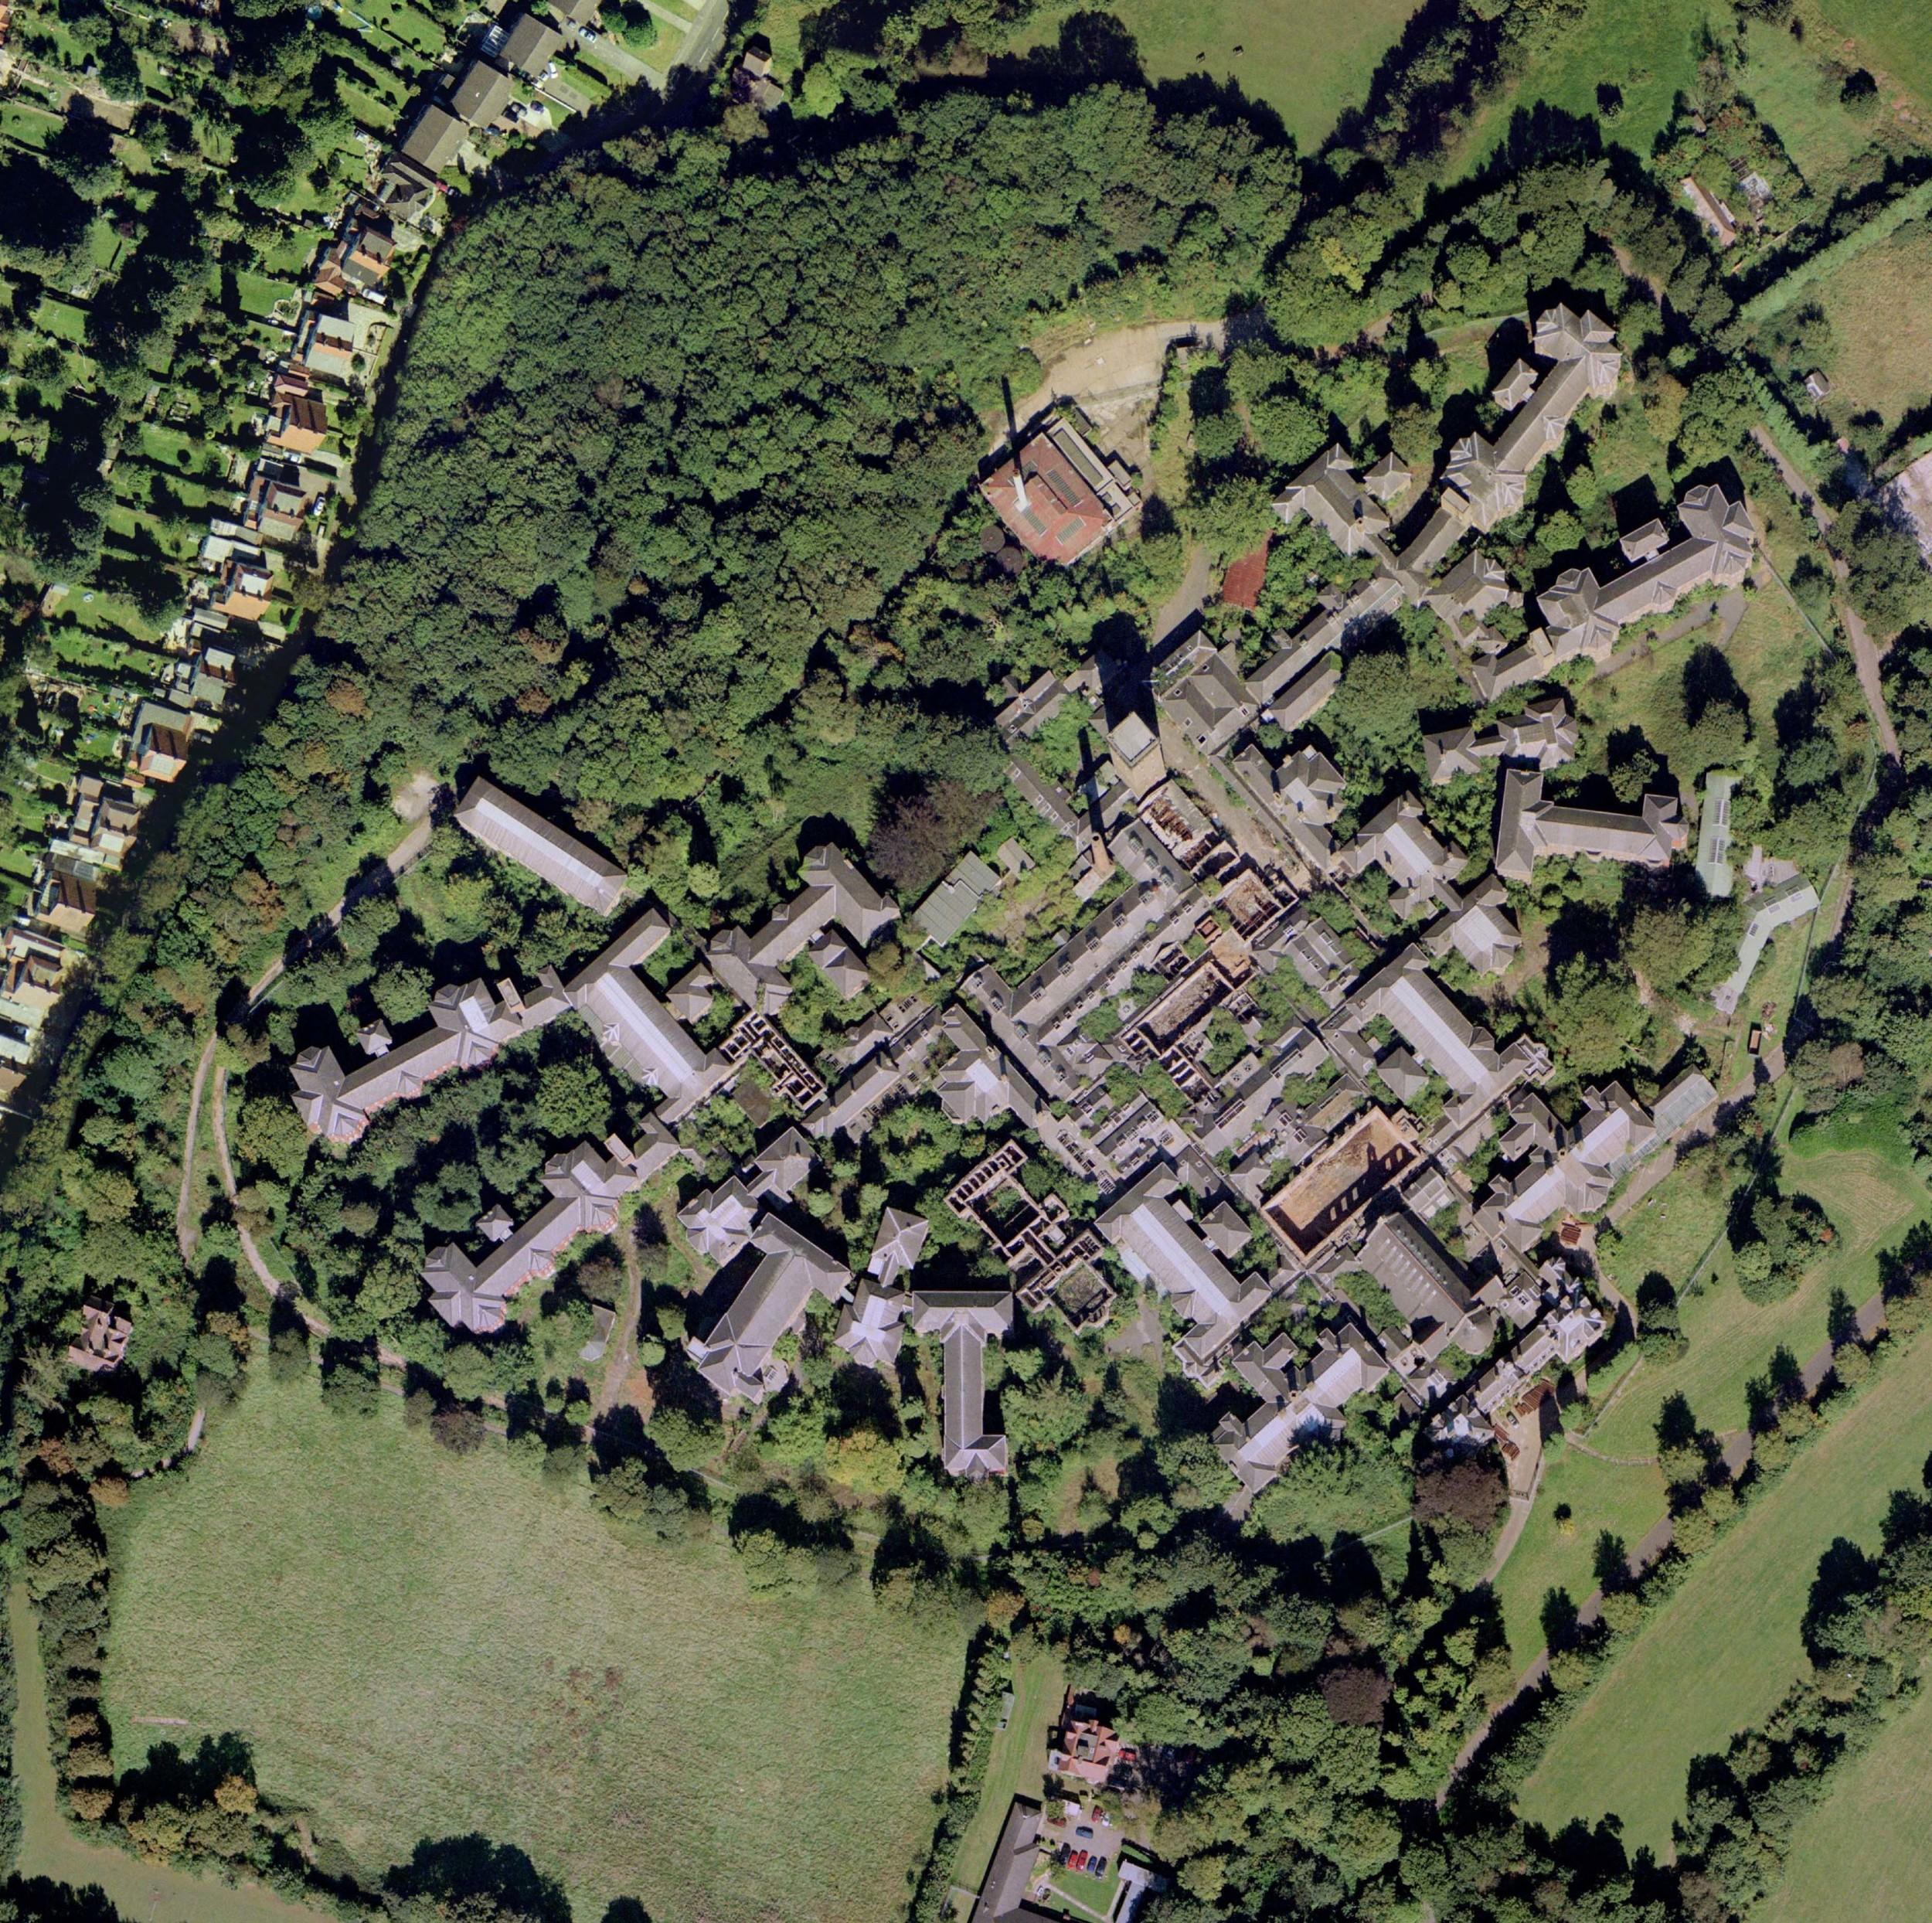 aerial photo, taken before the vincent/vanbrugh ward fire